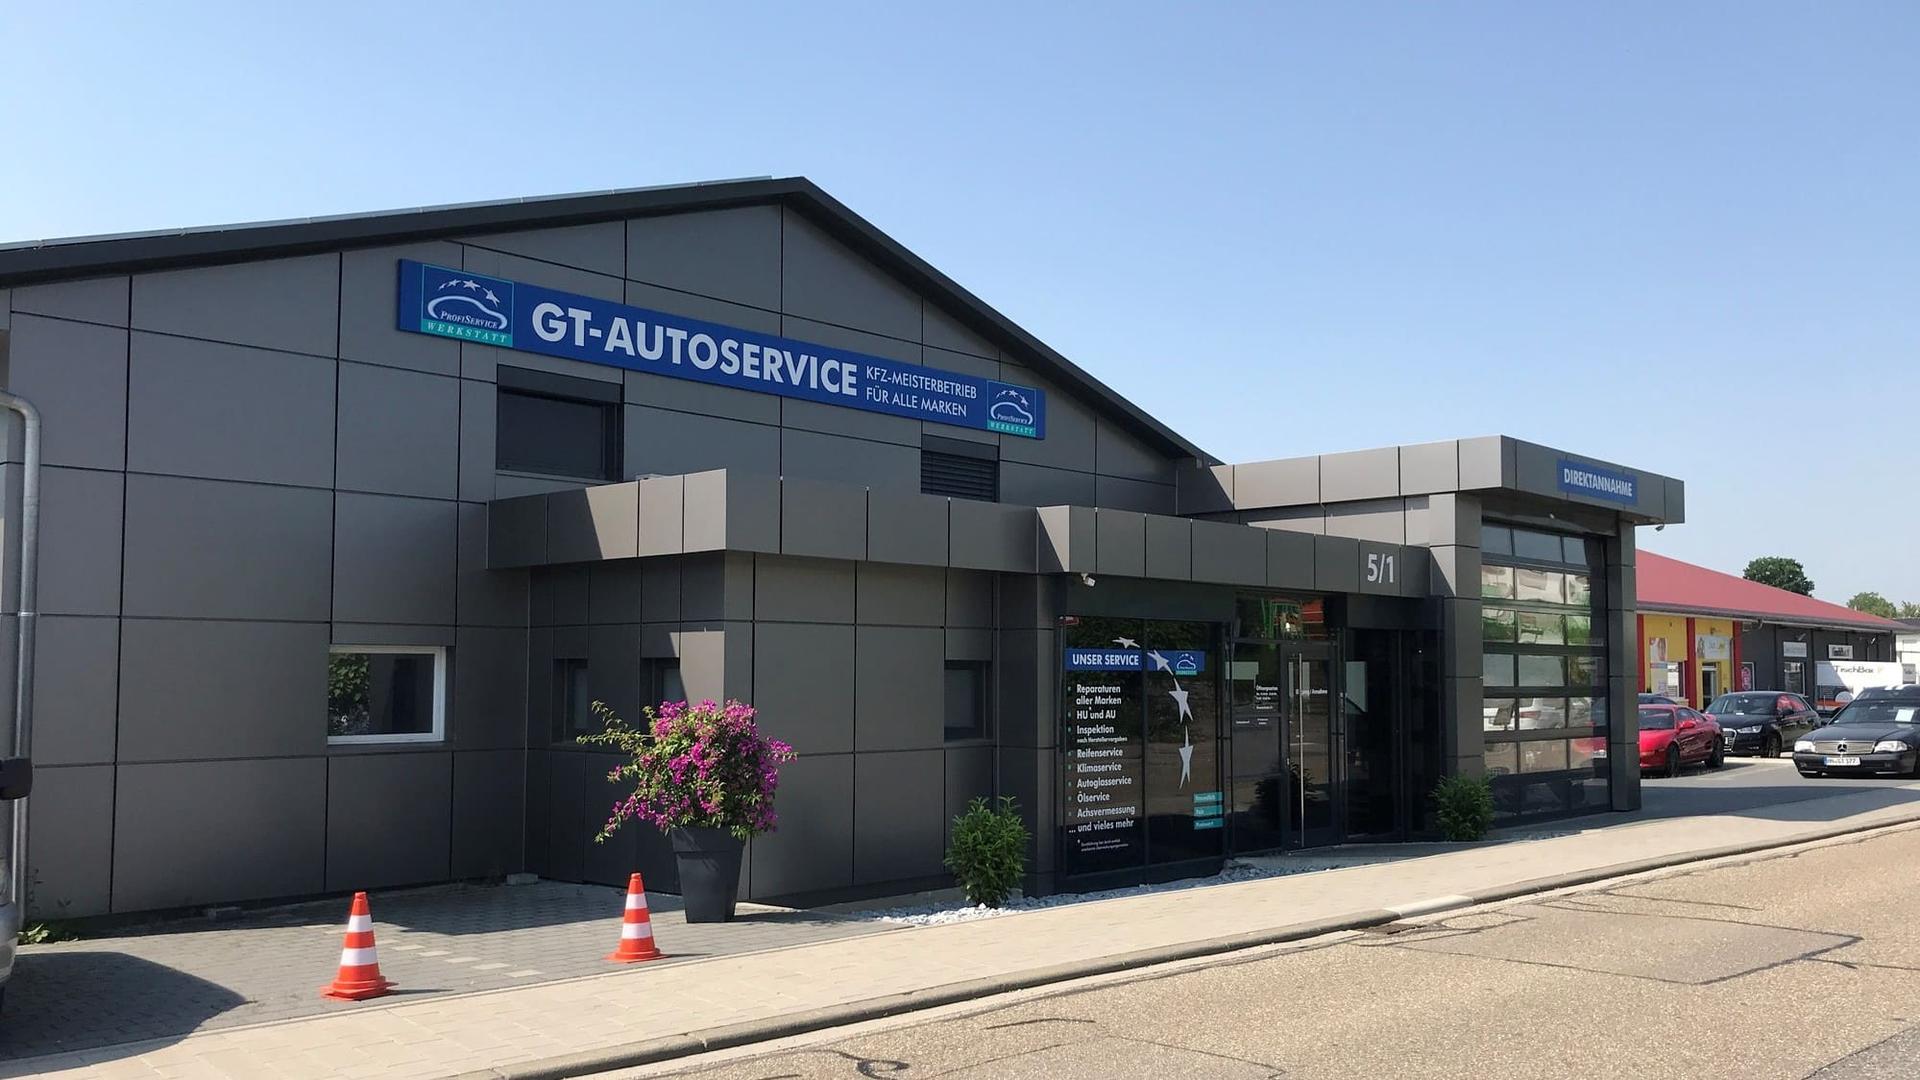 GT-Autoservice KFZ-Technikerbetrieb!